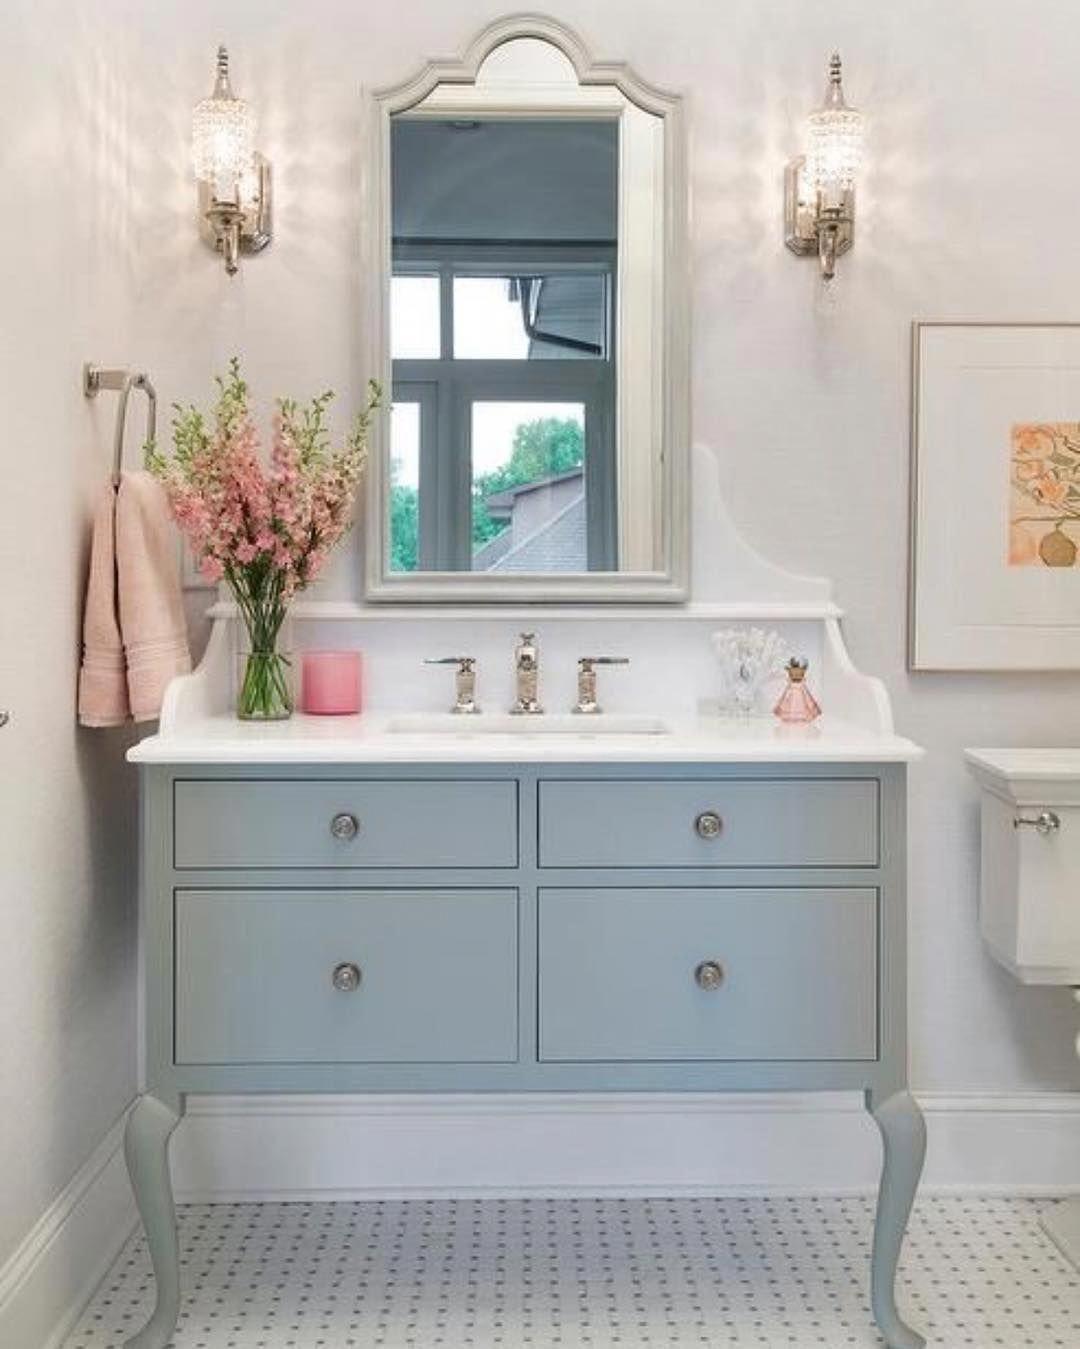 Bathroom Pictures Ideas Inspo Interior Vanity Budget